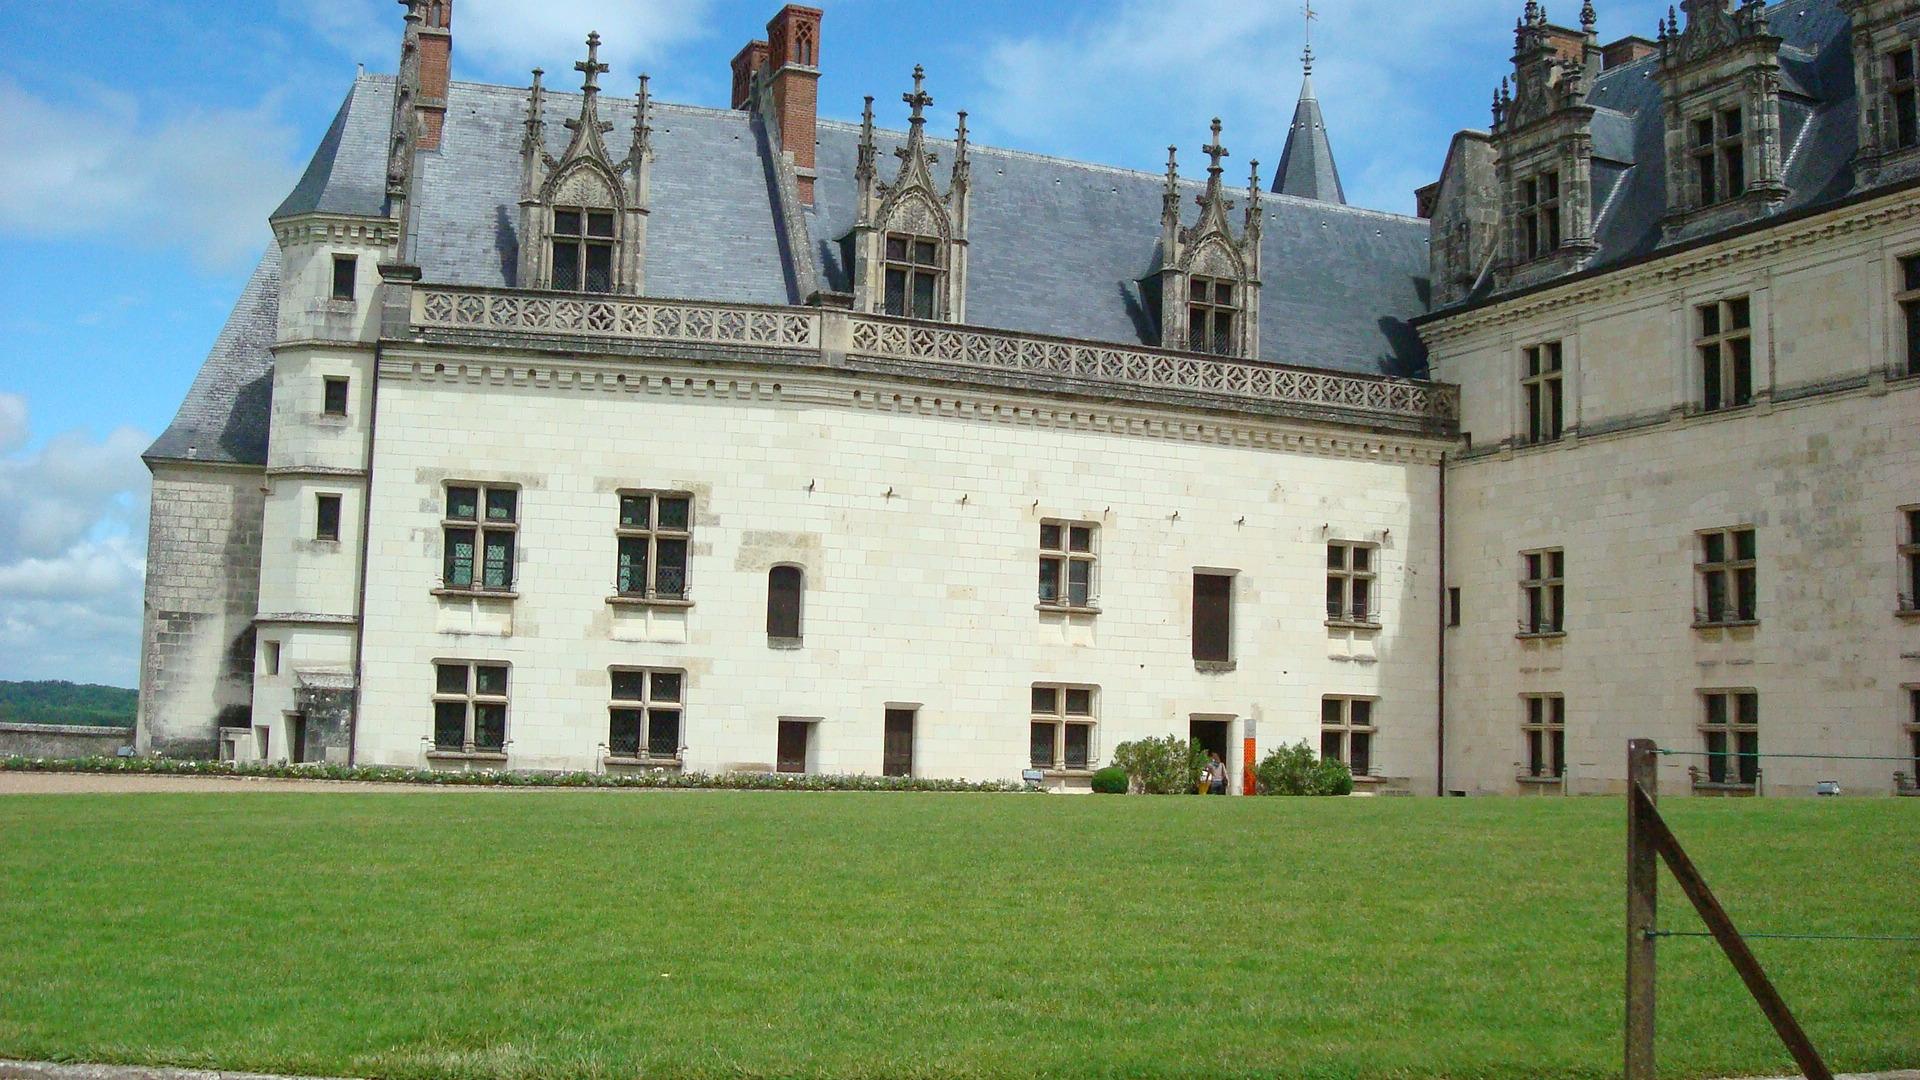 The Last of the Loire Chartres Chateau de Chambord Amboise